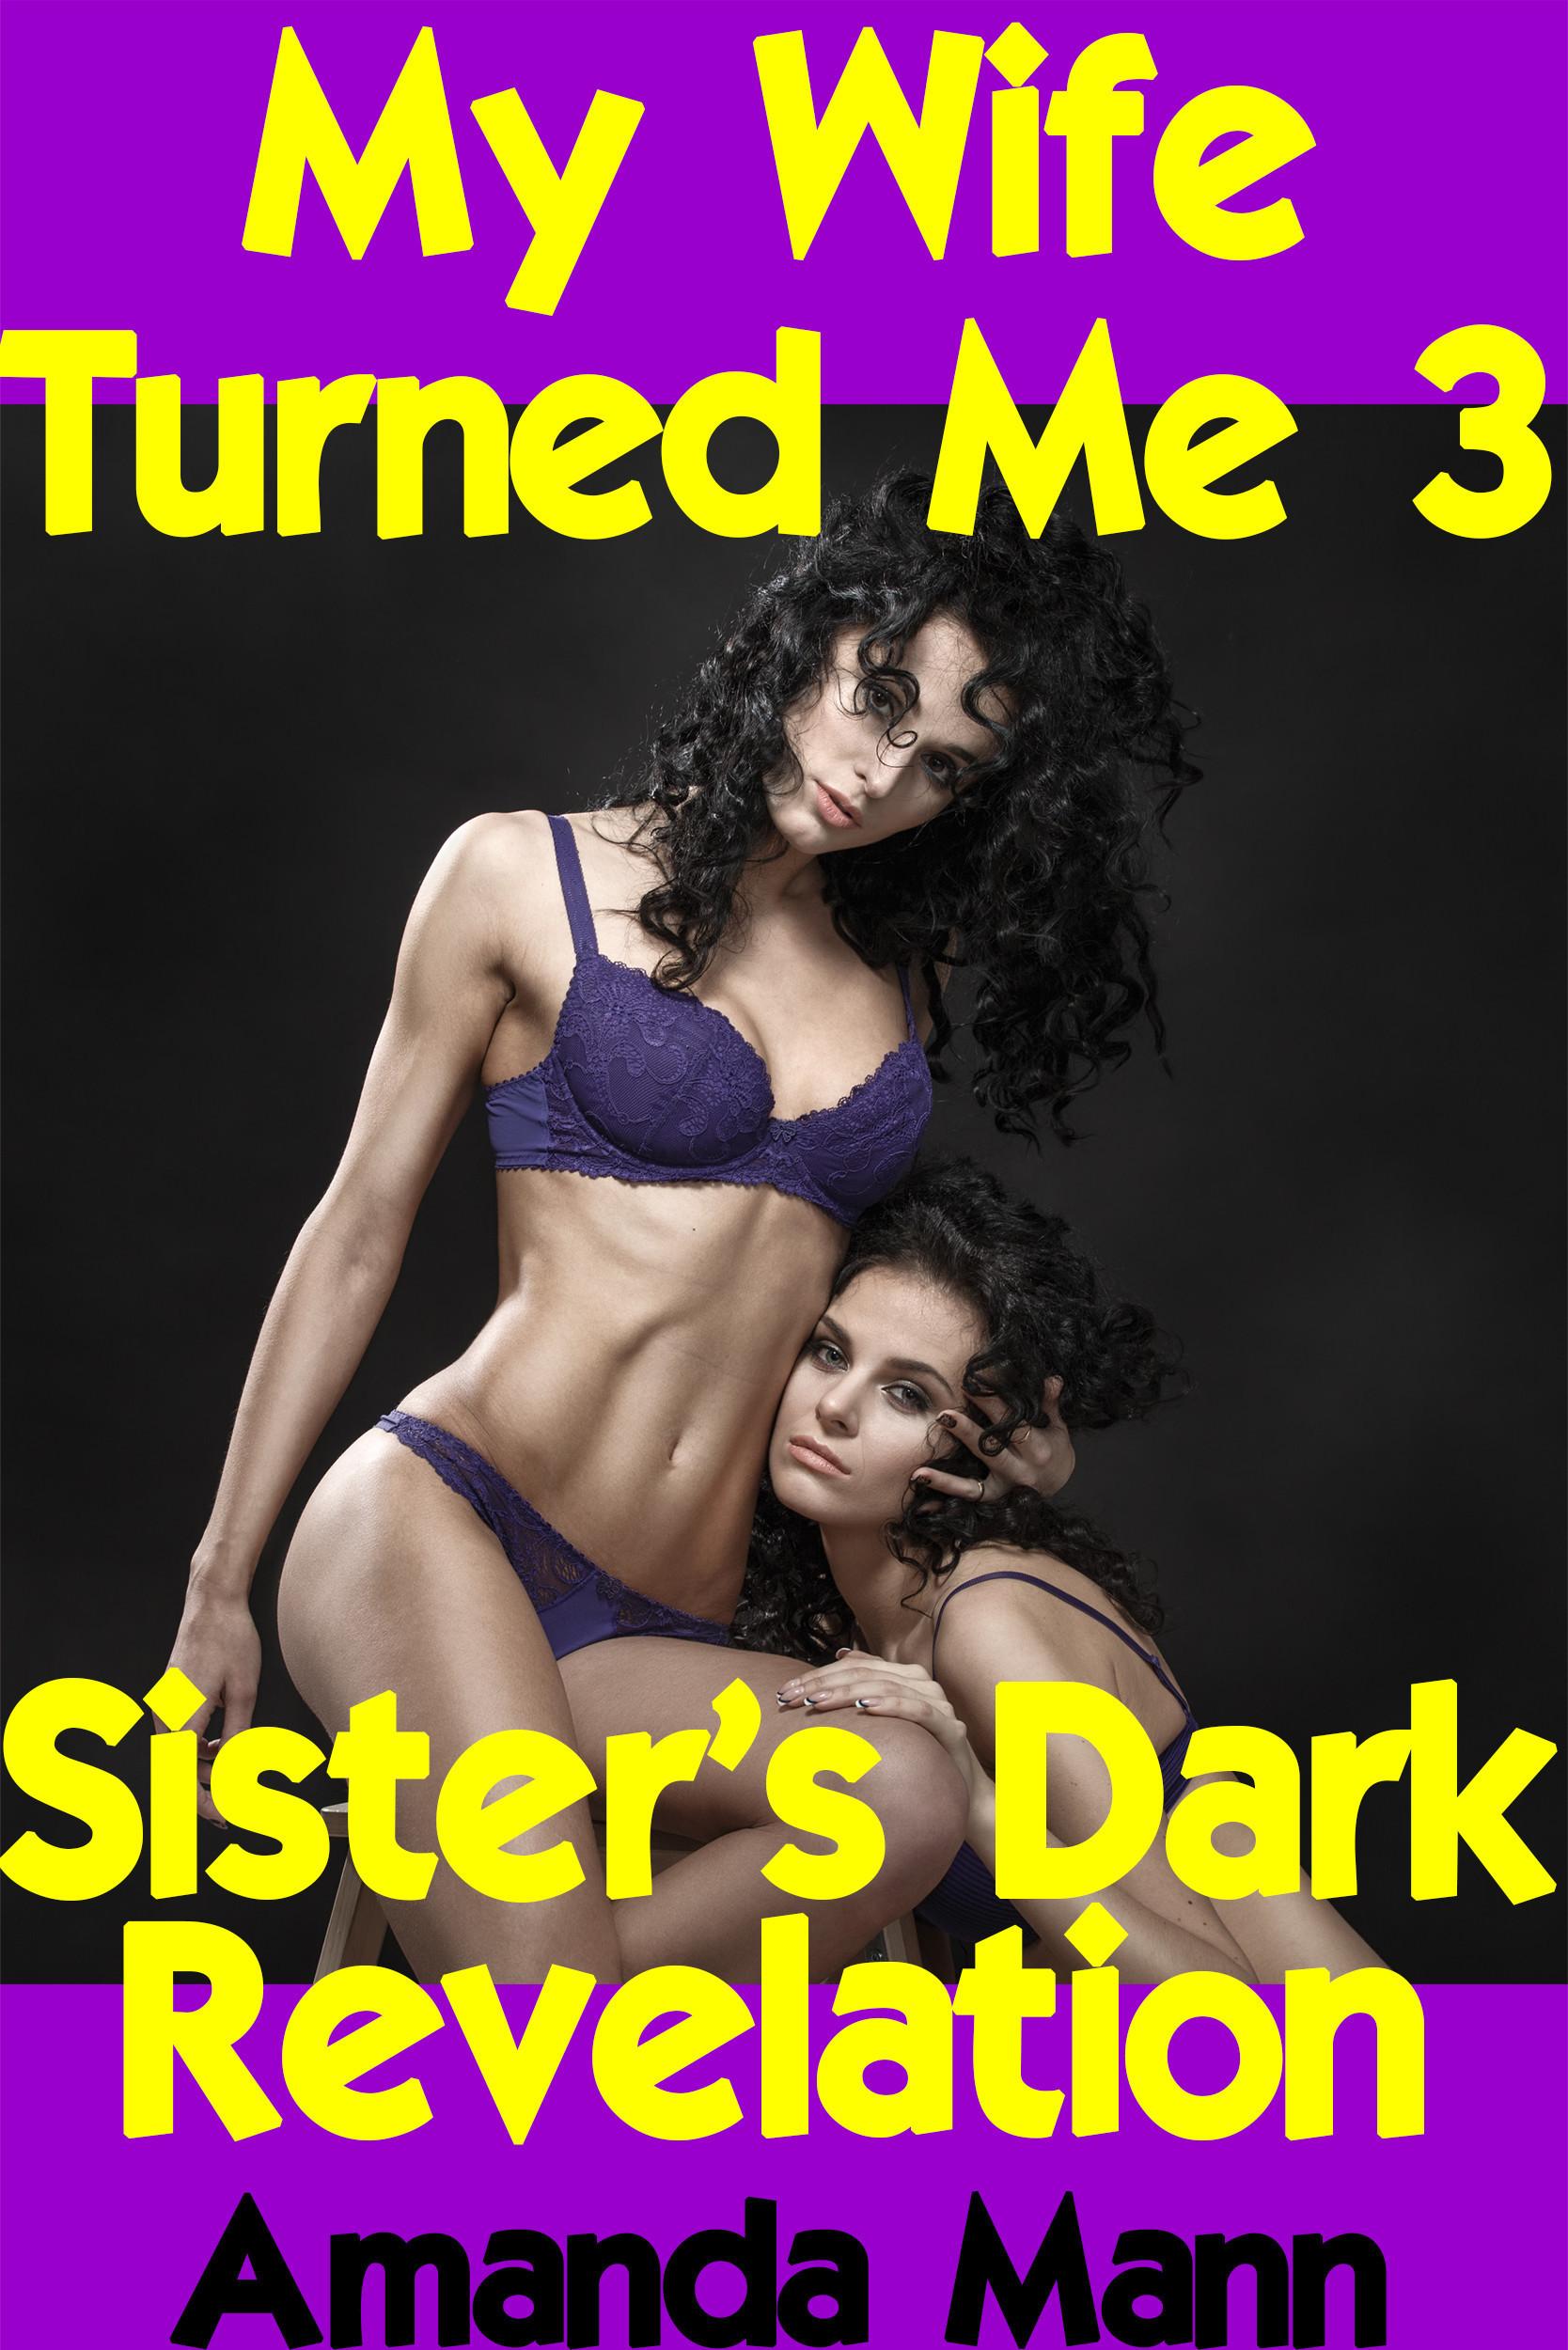 My Wife Turned Me 3: Sisters Dark Revelation Amanda Mann